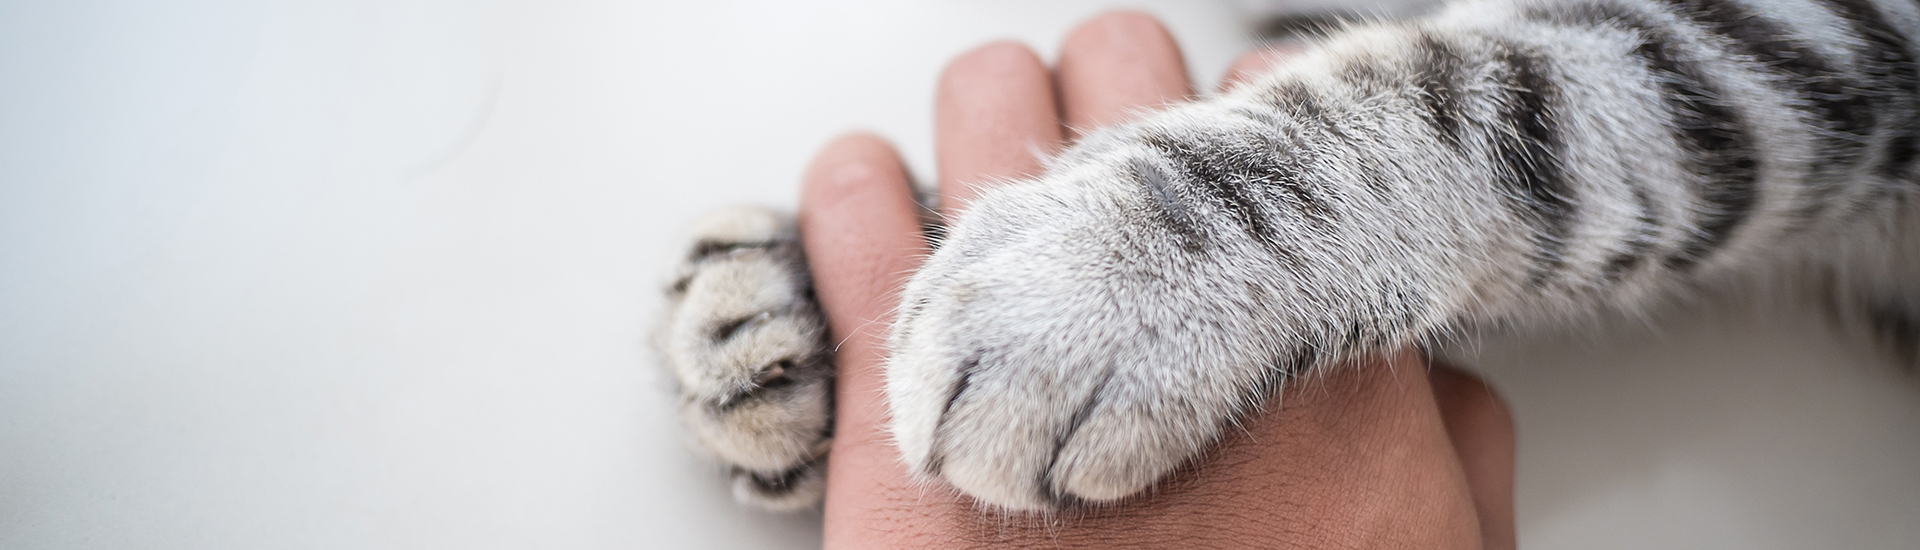 cat holding human hand